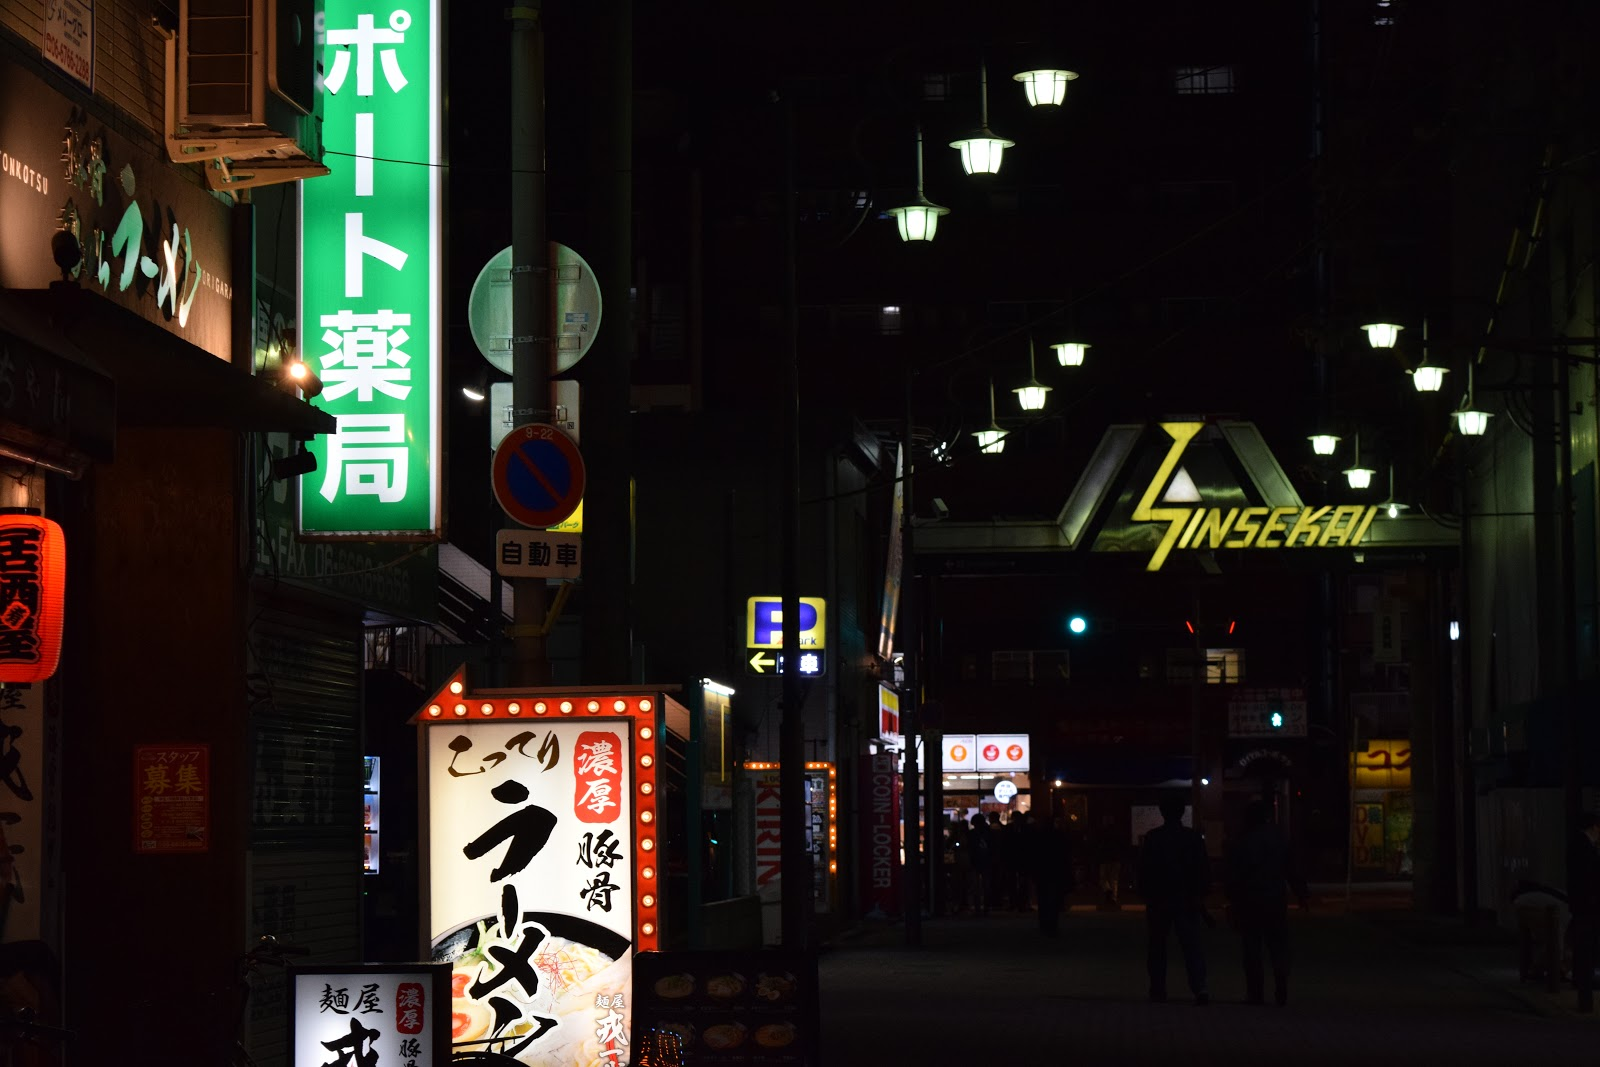 Side street in Shinsekai, Osaka at night